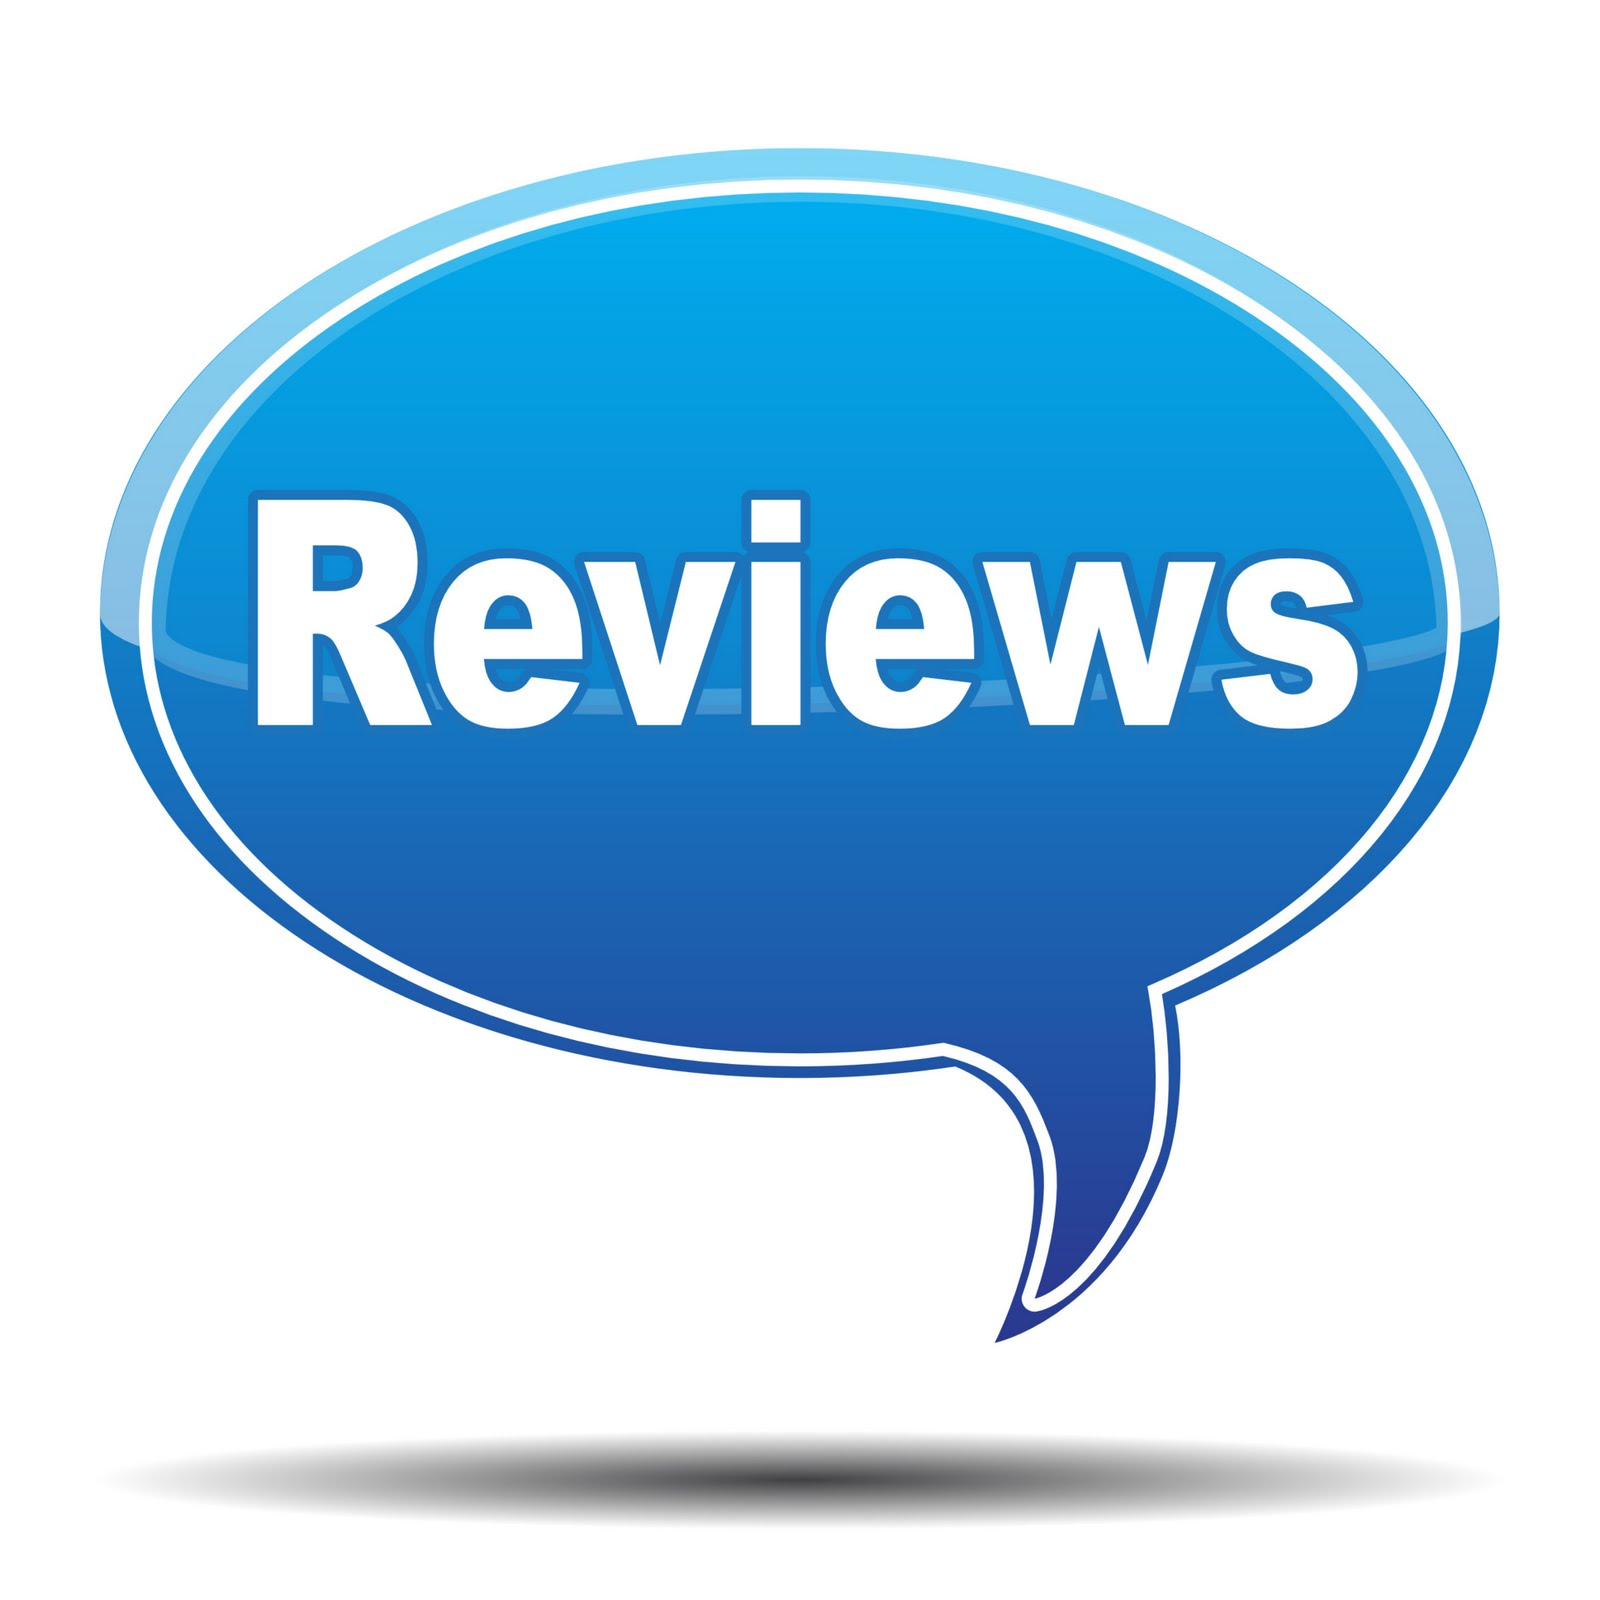 Reviews: Hudson's Coupon Lady: Fotolia Review